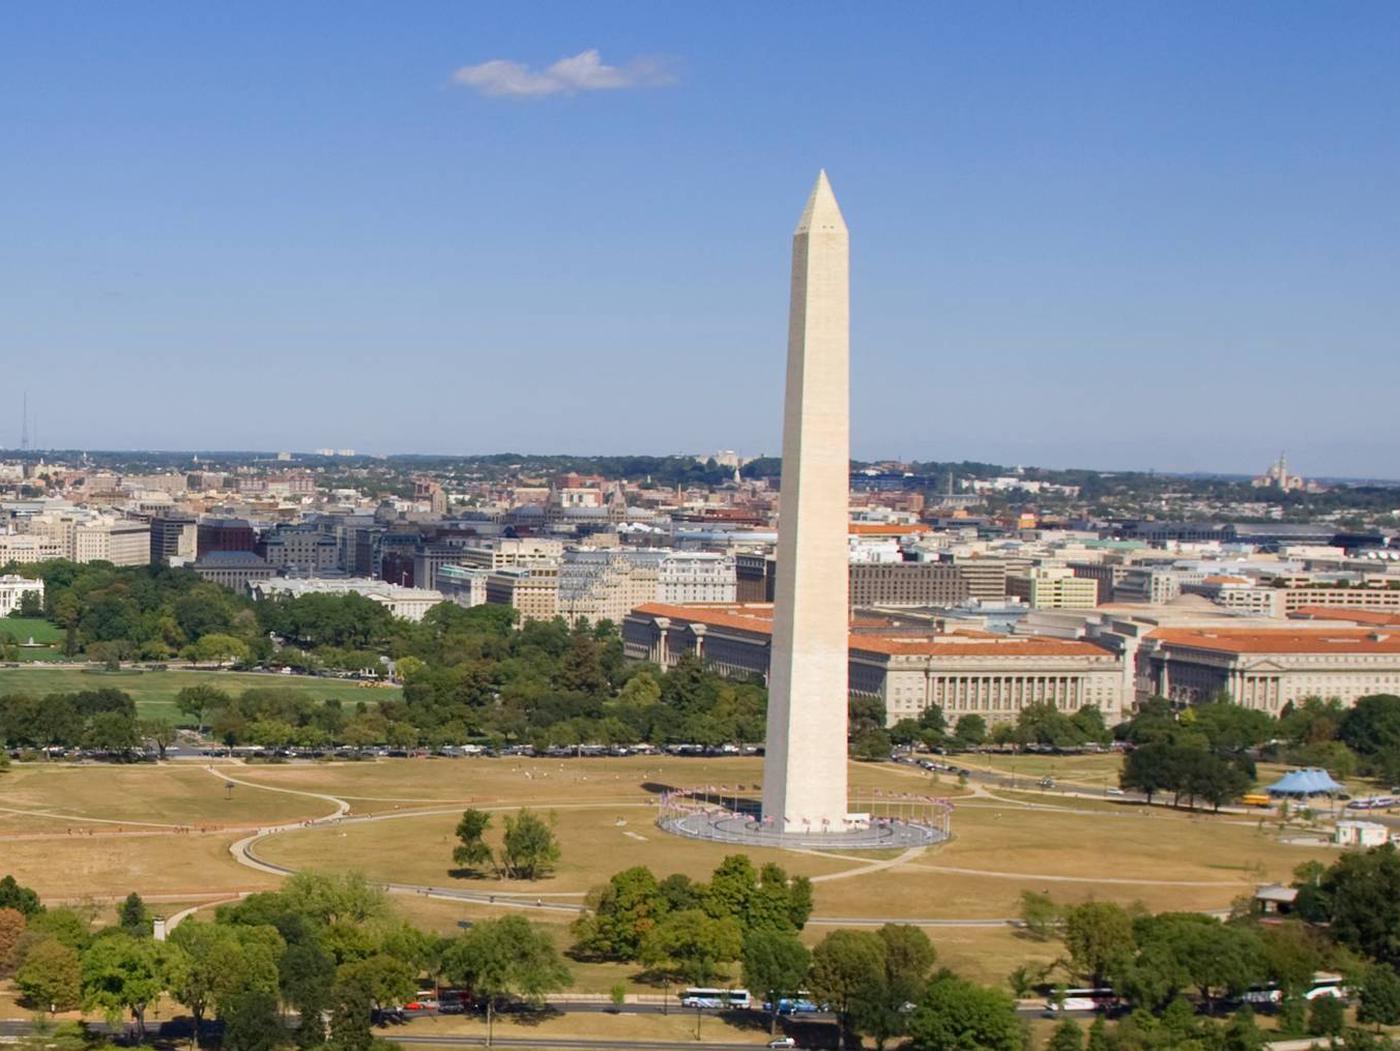 Washington MonumentWashington Monument from the air